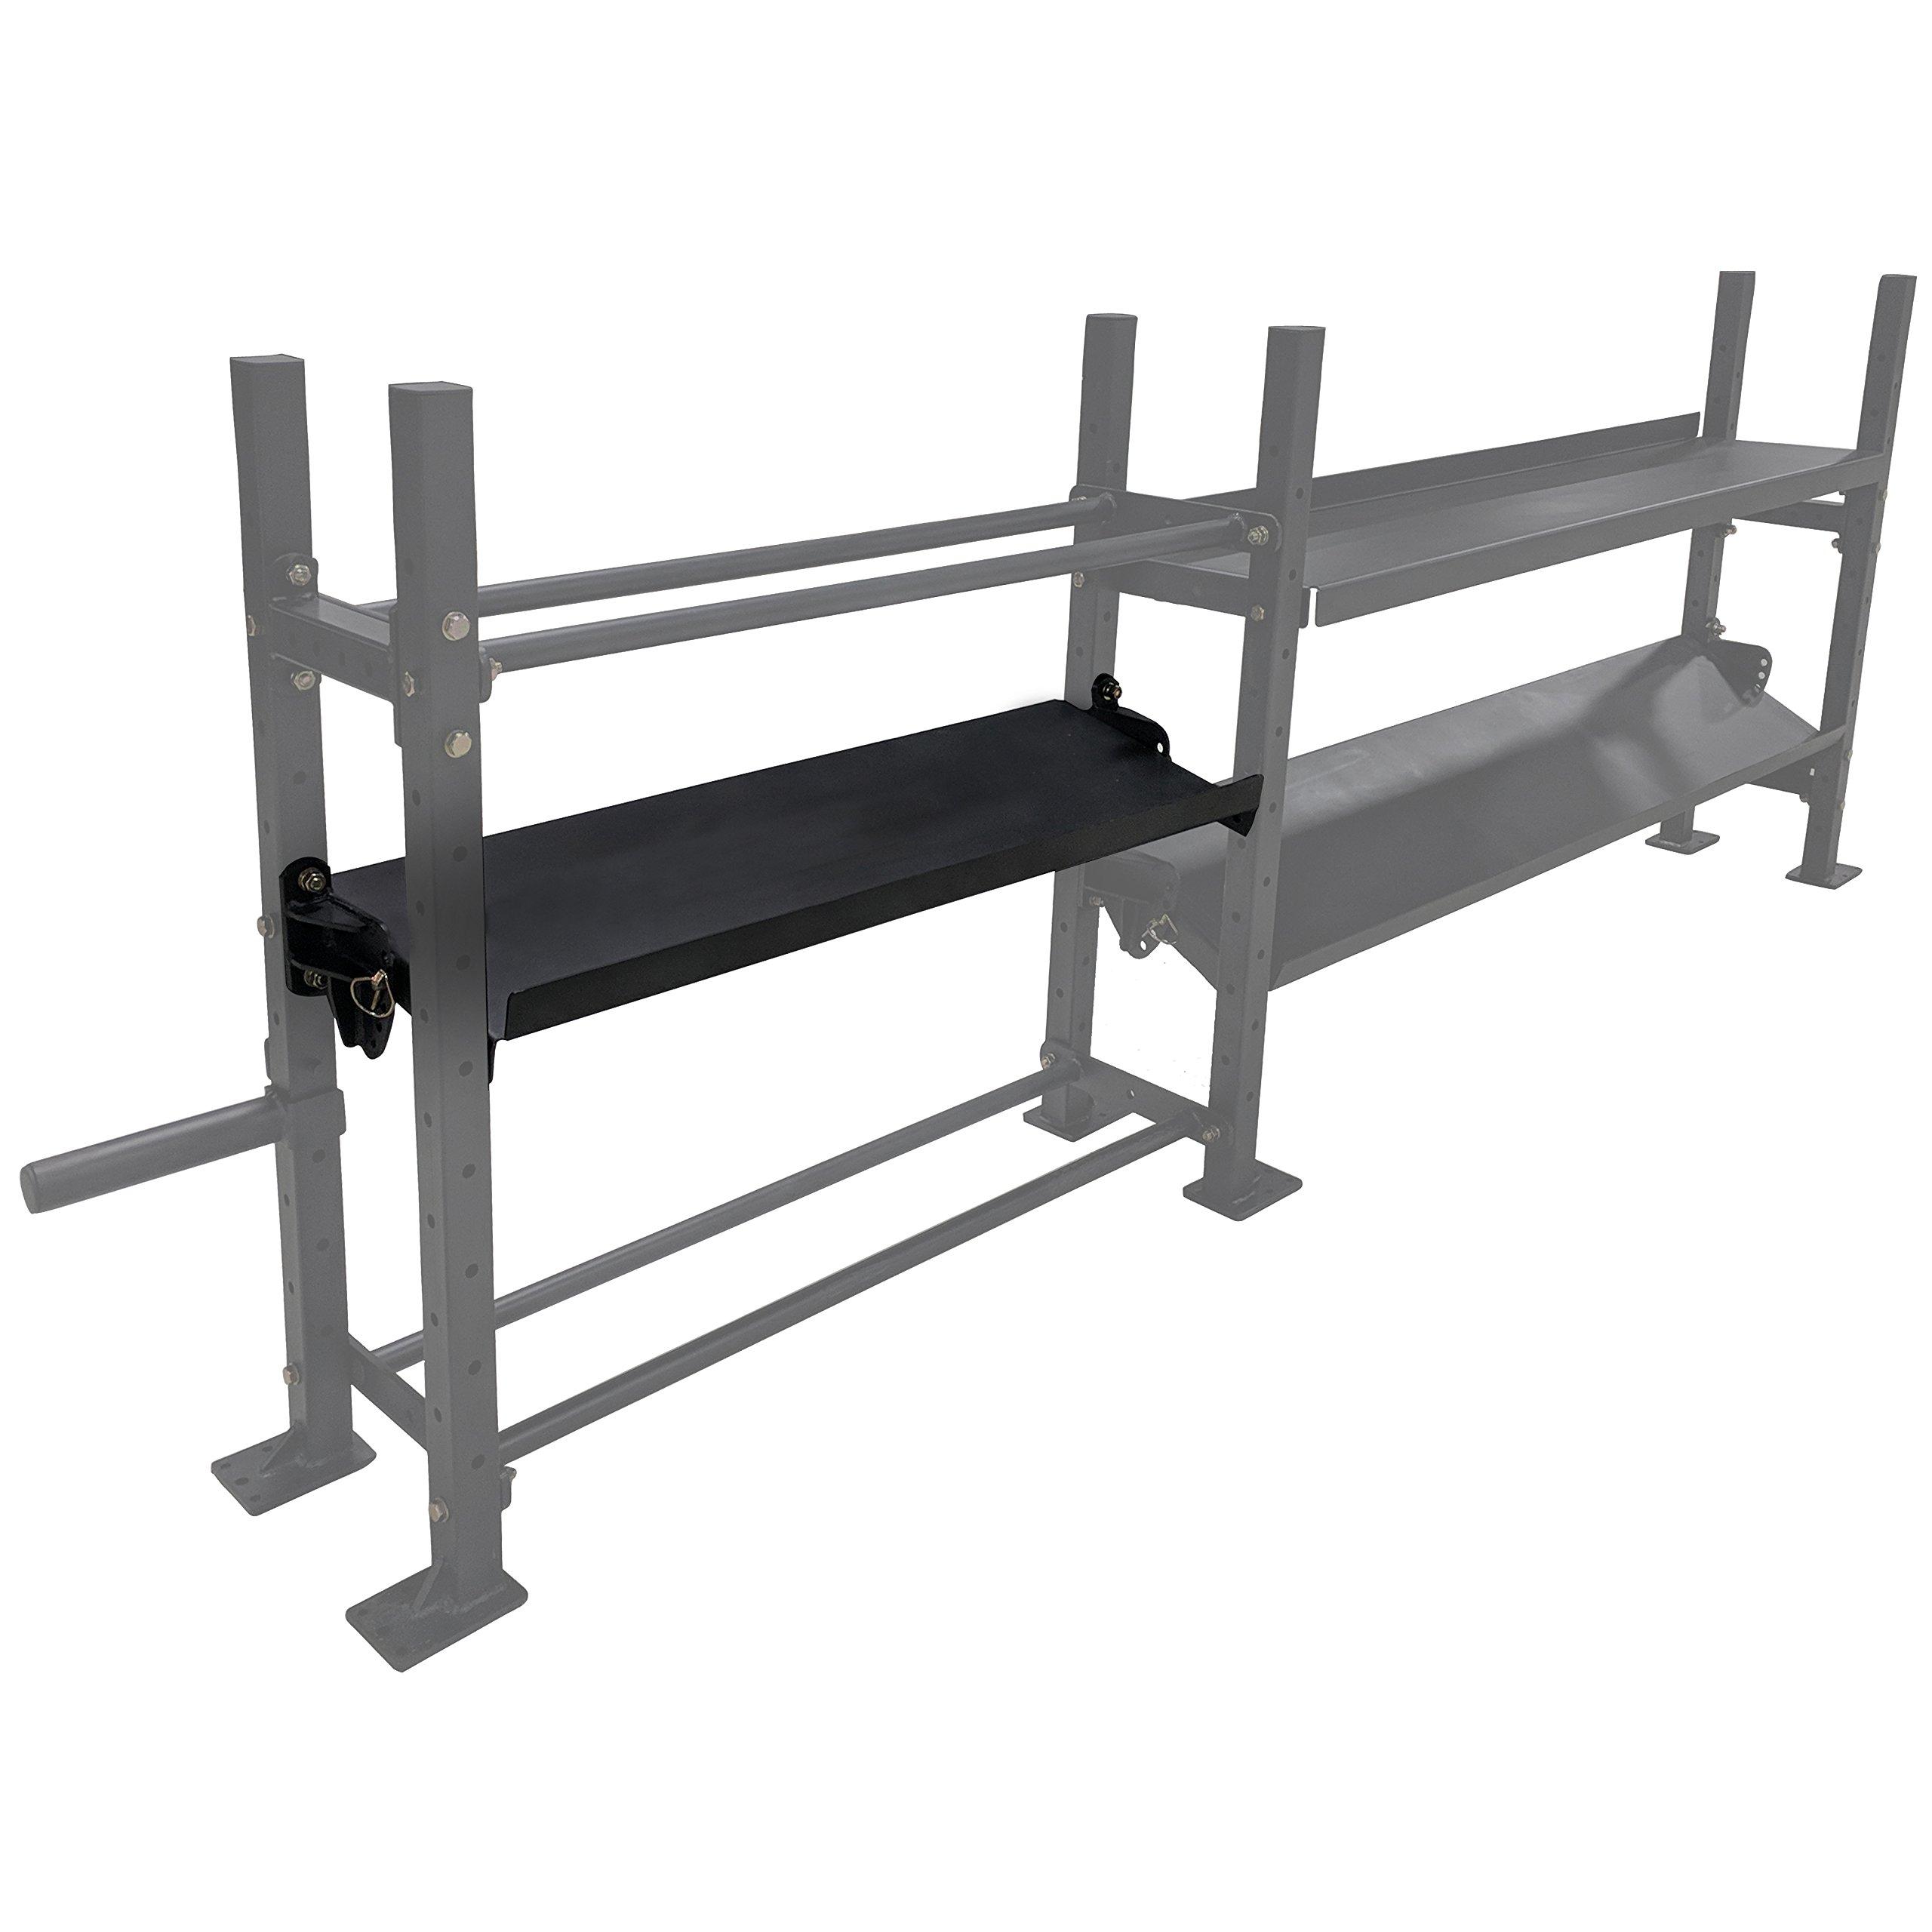 Titan 70'' Rotating Shelf for Mass Storage System by Titan Fitness